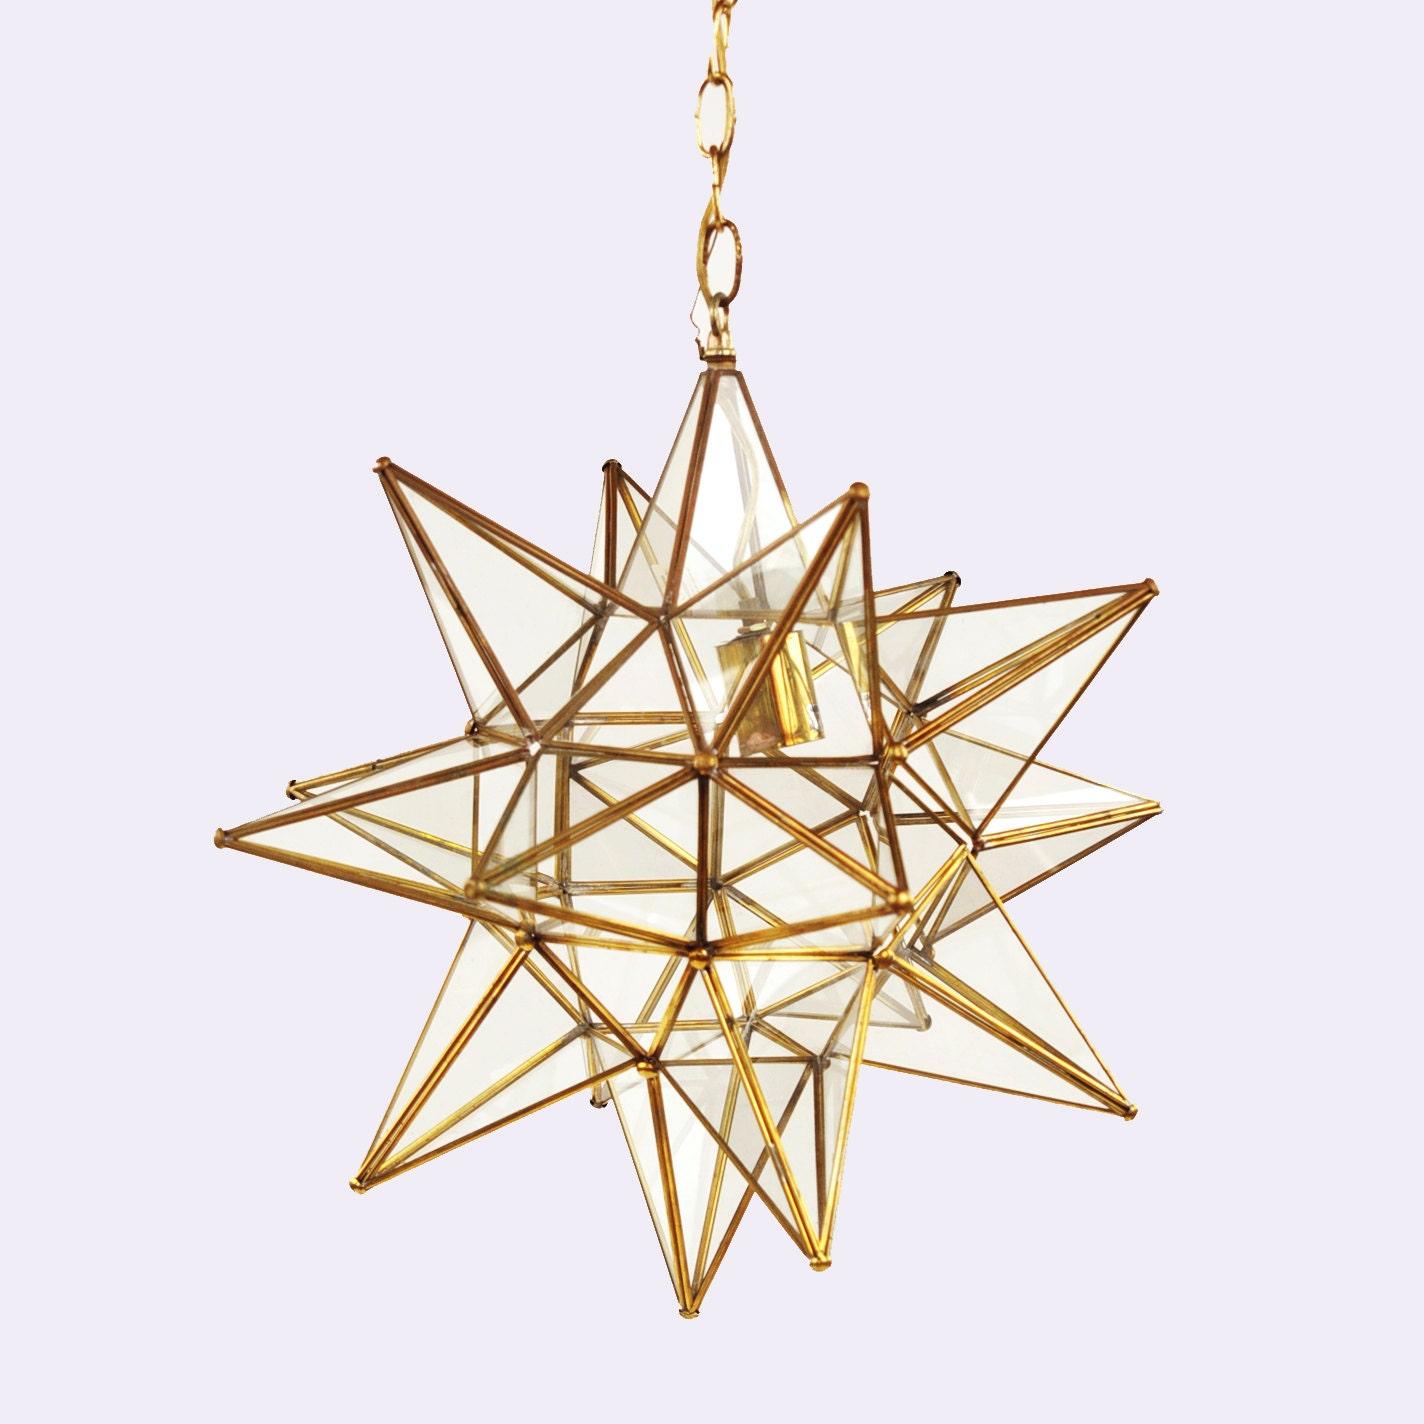 Vintage 1970 39 S Gold Moravian Star Geometric Glass Hanging